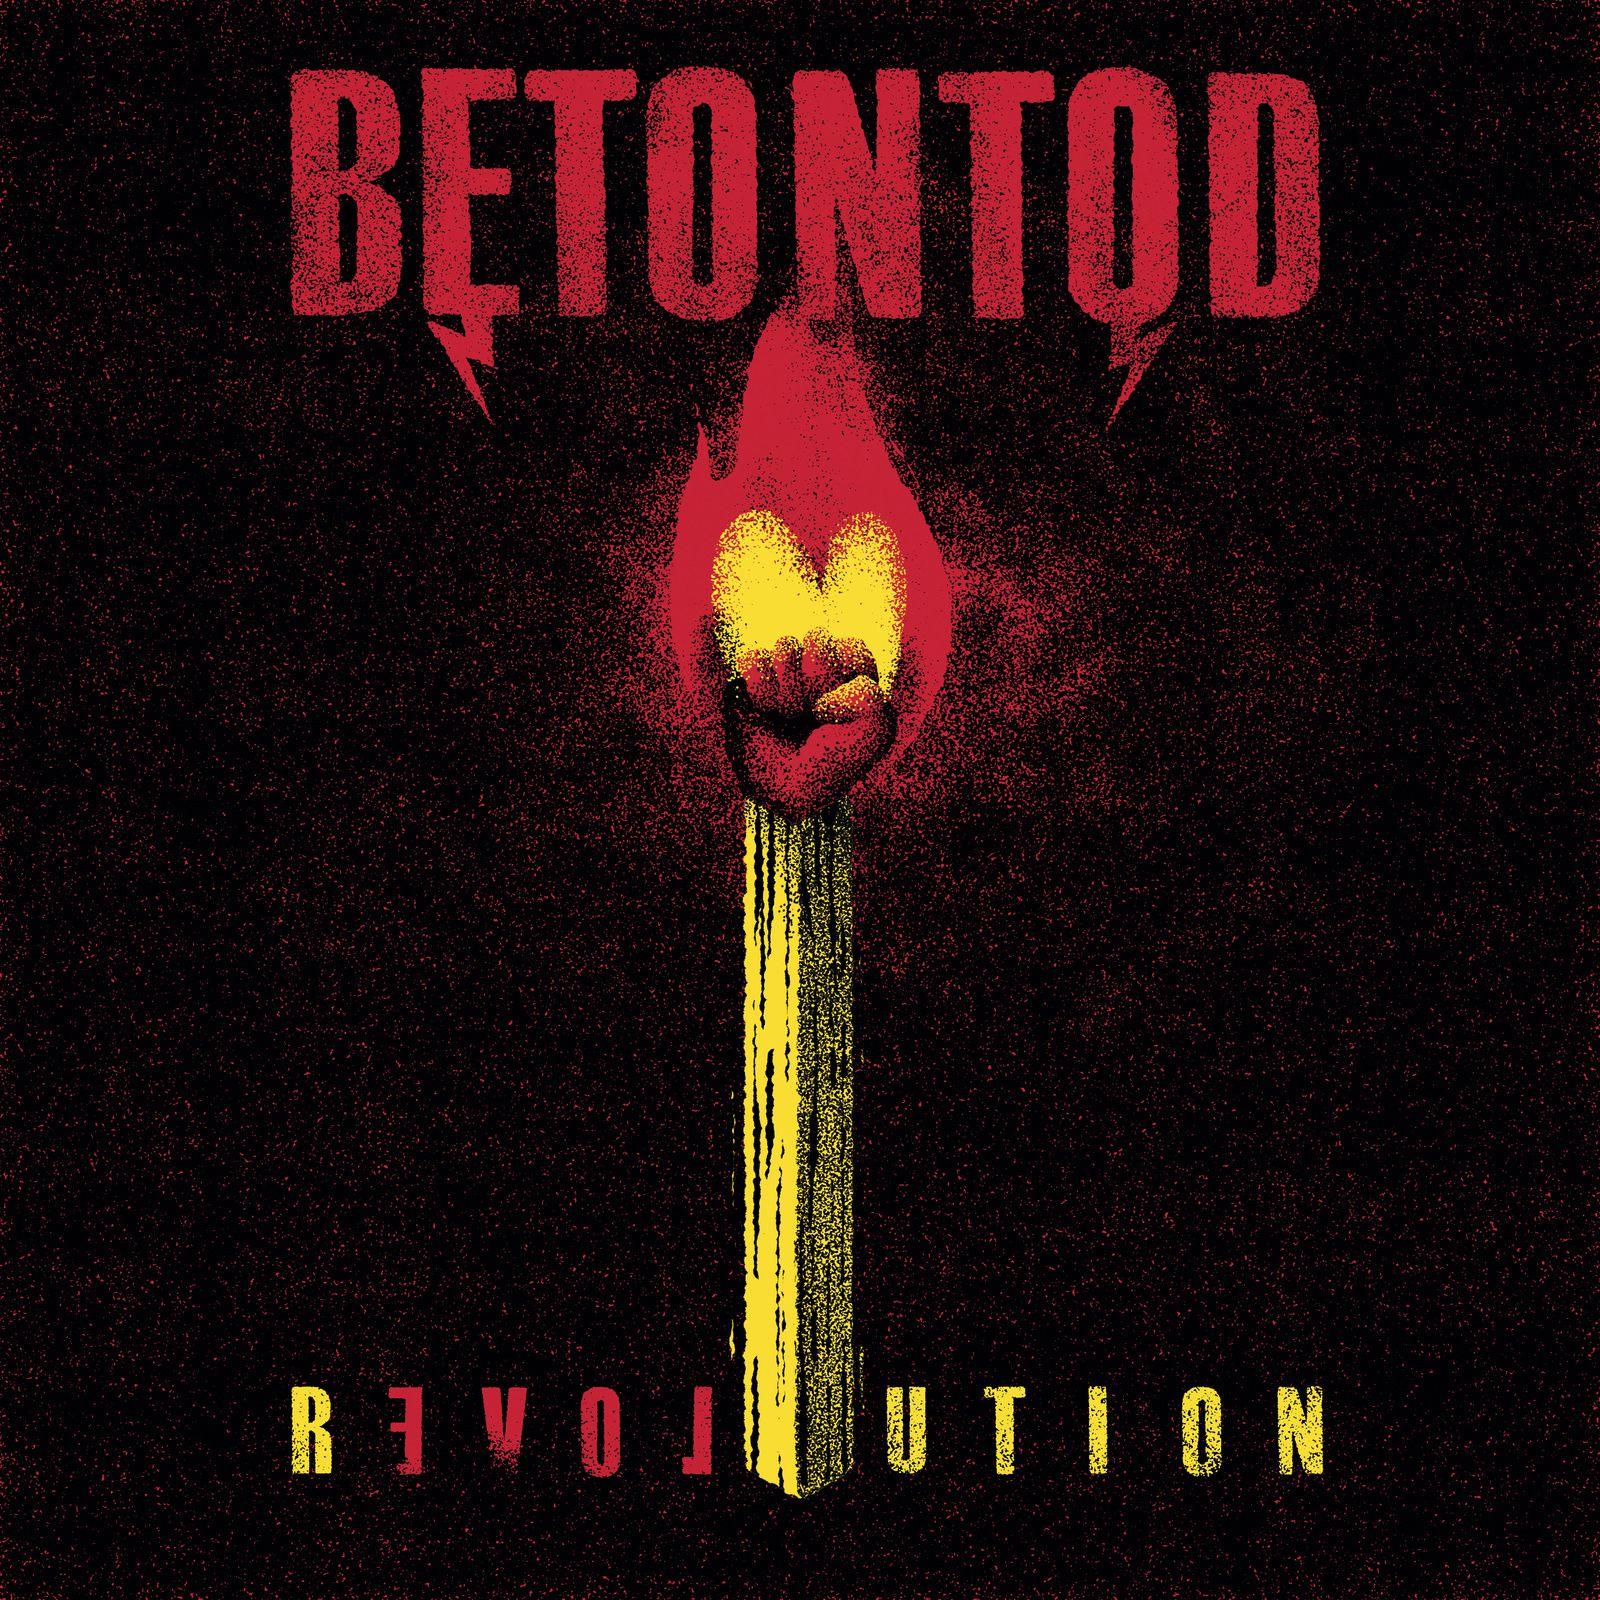 "CD review BETONTOD"" Revolution"""